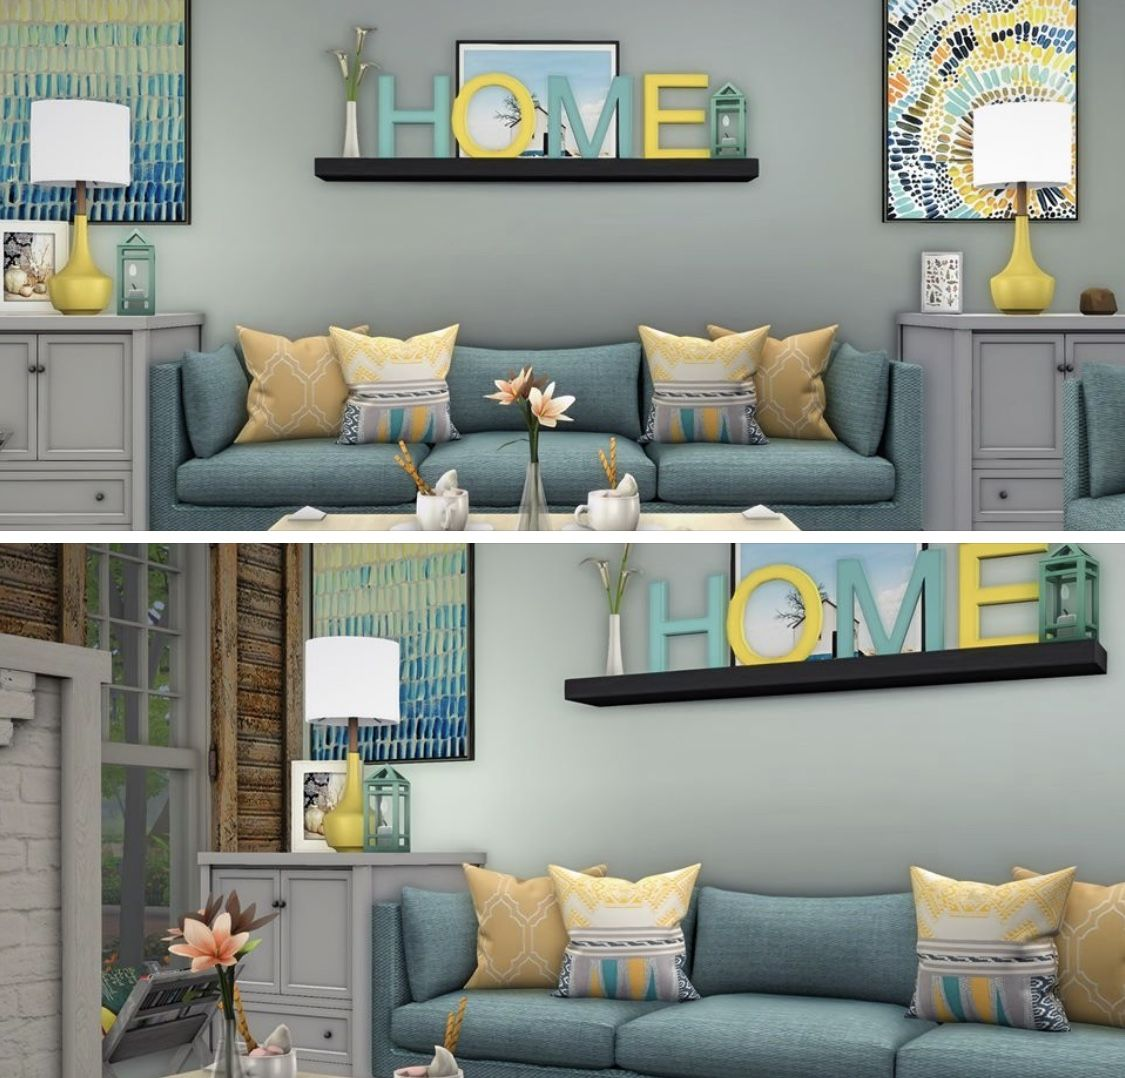 Pin by Ⓓⓐⓢⓘⓐ Ⓐⓡⓜⓞⓝⓘ on Sims 4 cc | Home decor, Decor ...